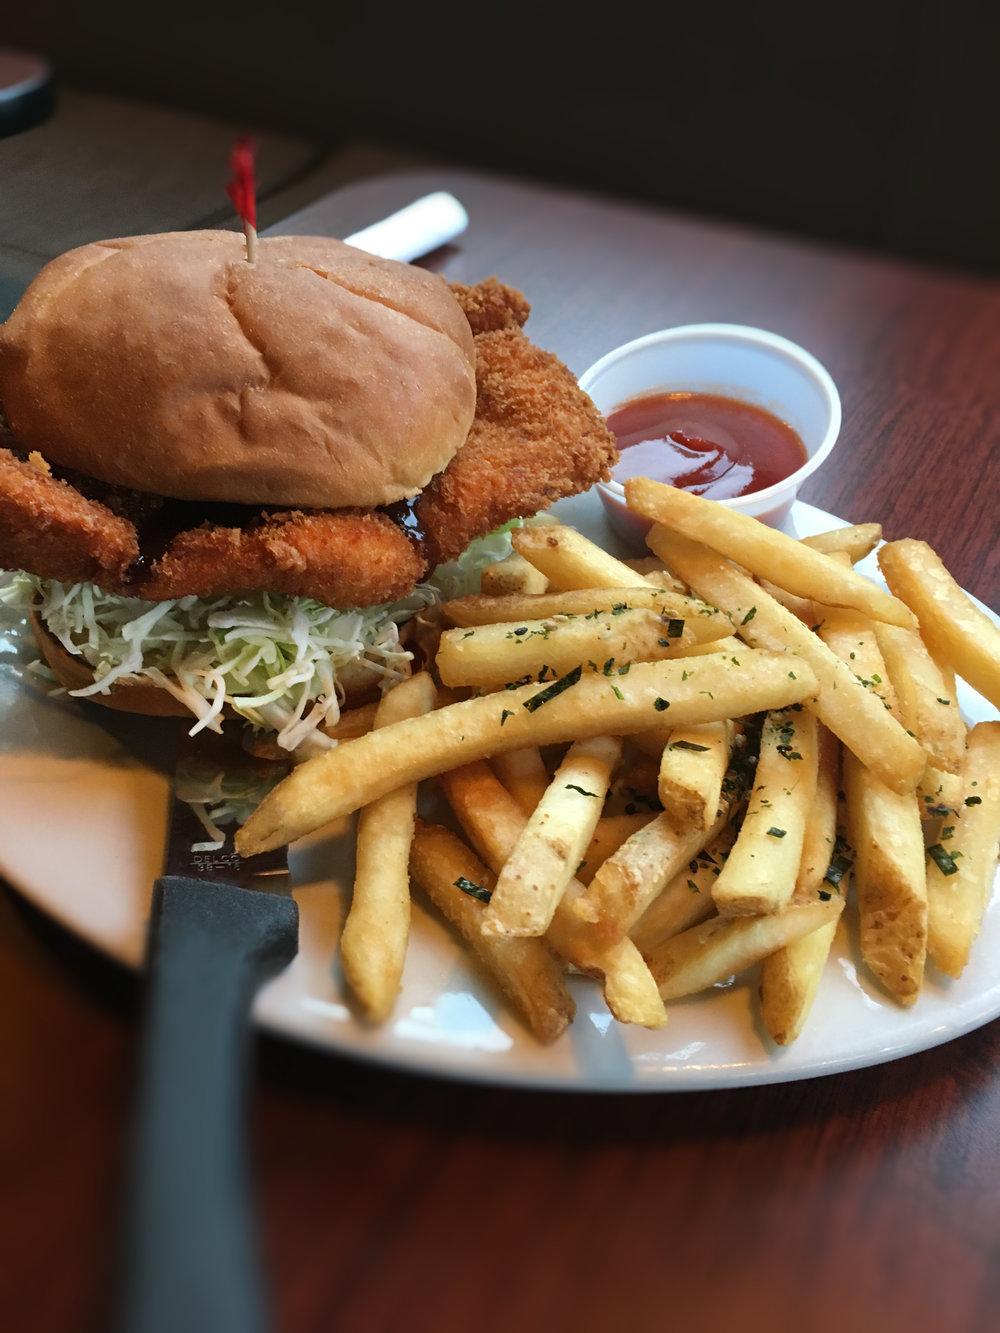 T's Pork Komfort Katsu Burger